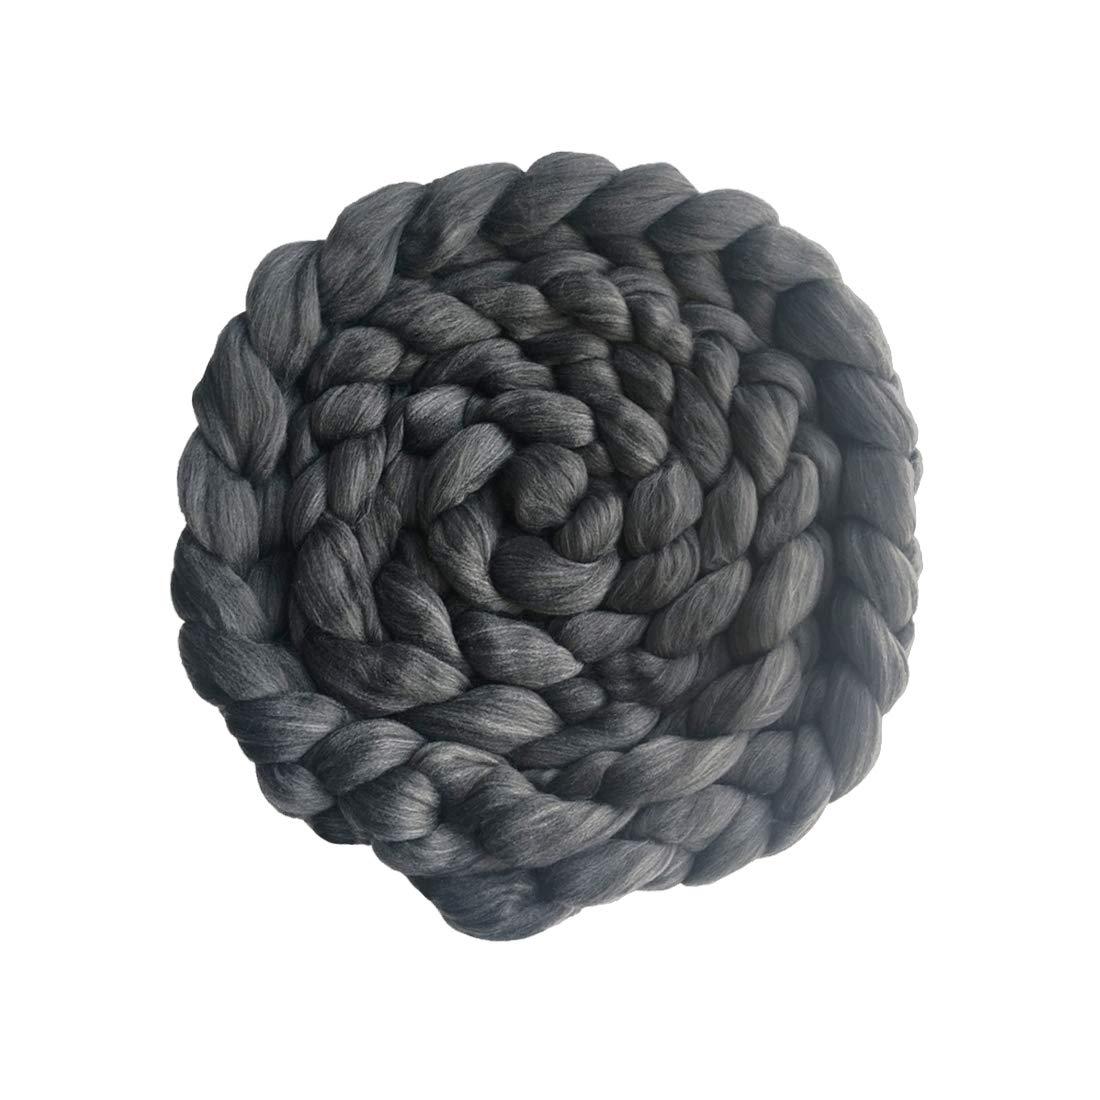 Newborn Photography Props Blanket Basket Braid Wool Wrap Newborn Baby Photography Props(Deep Grey)